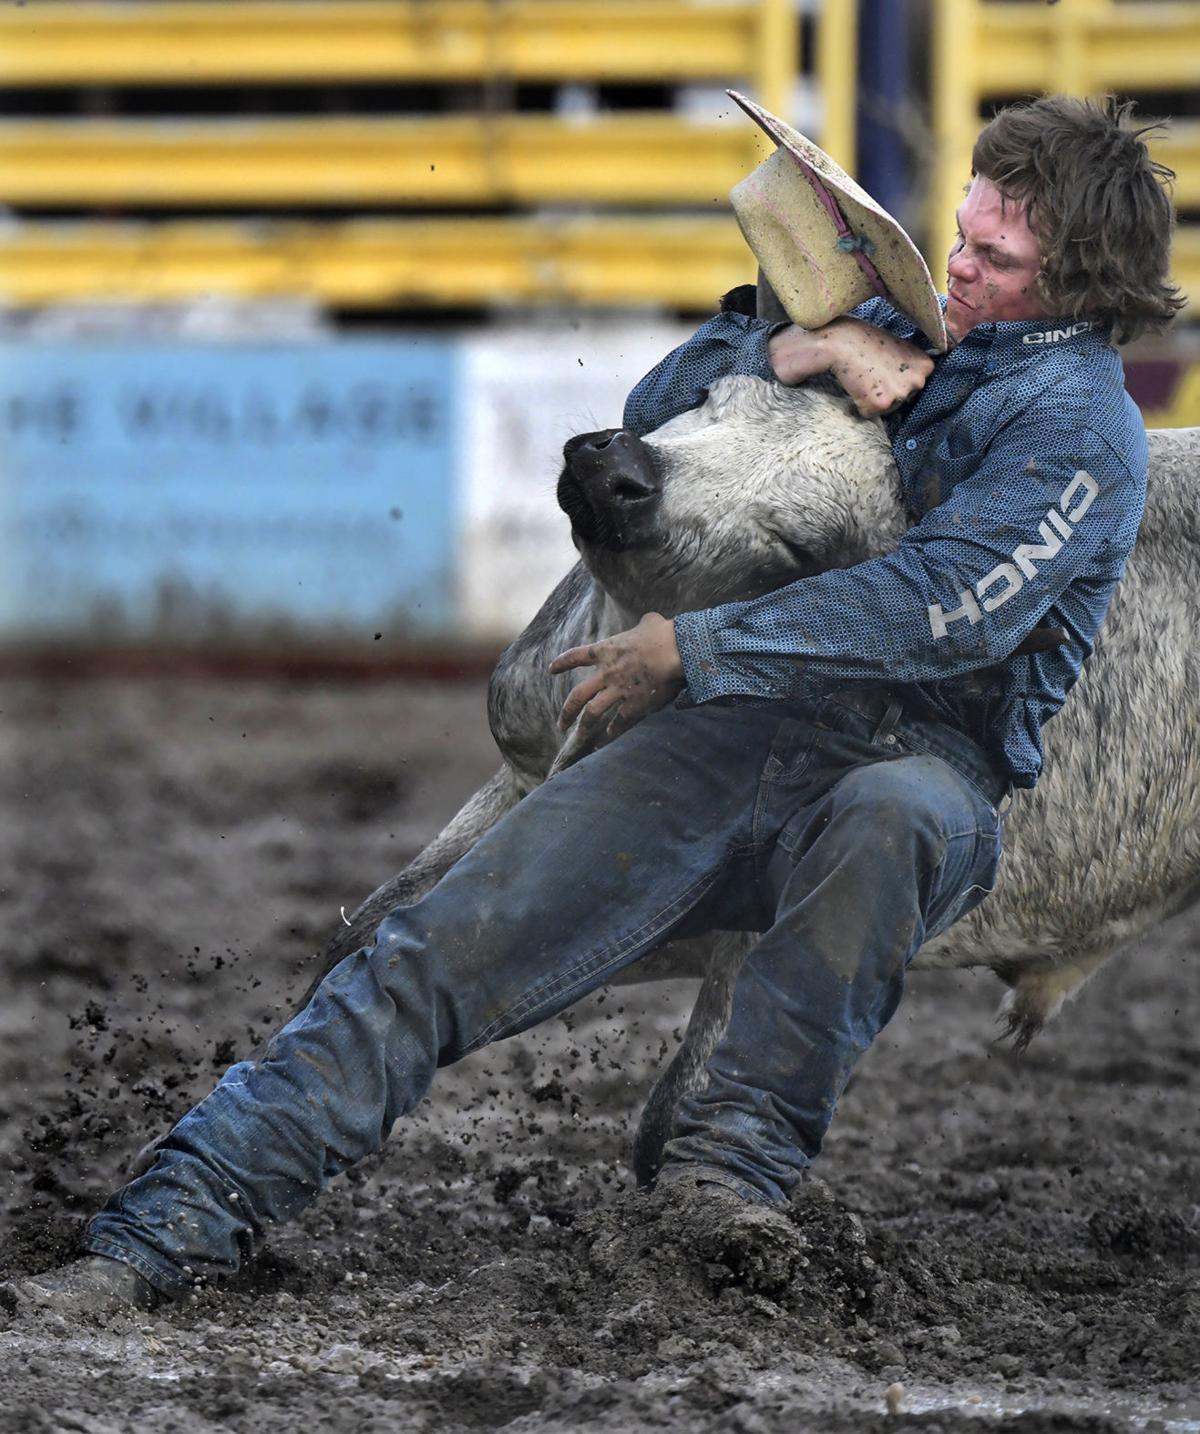 081119 rodeo-6-tm.jpg